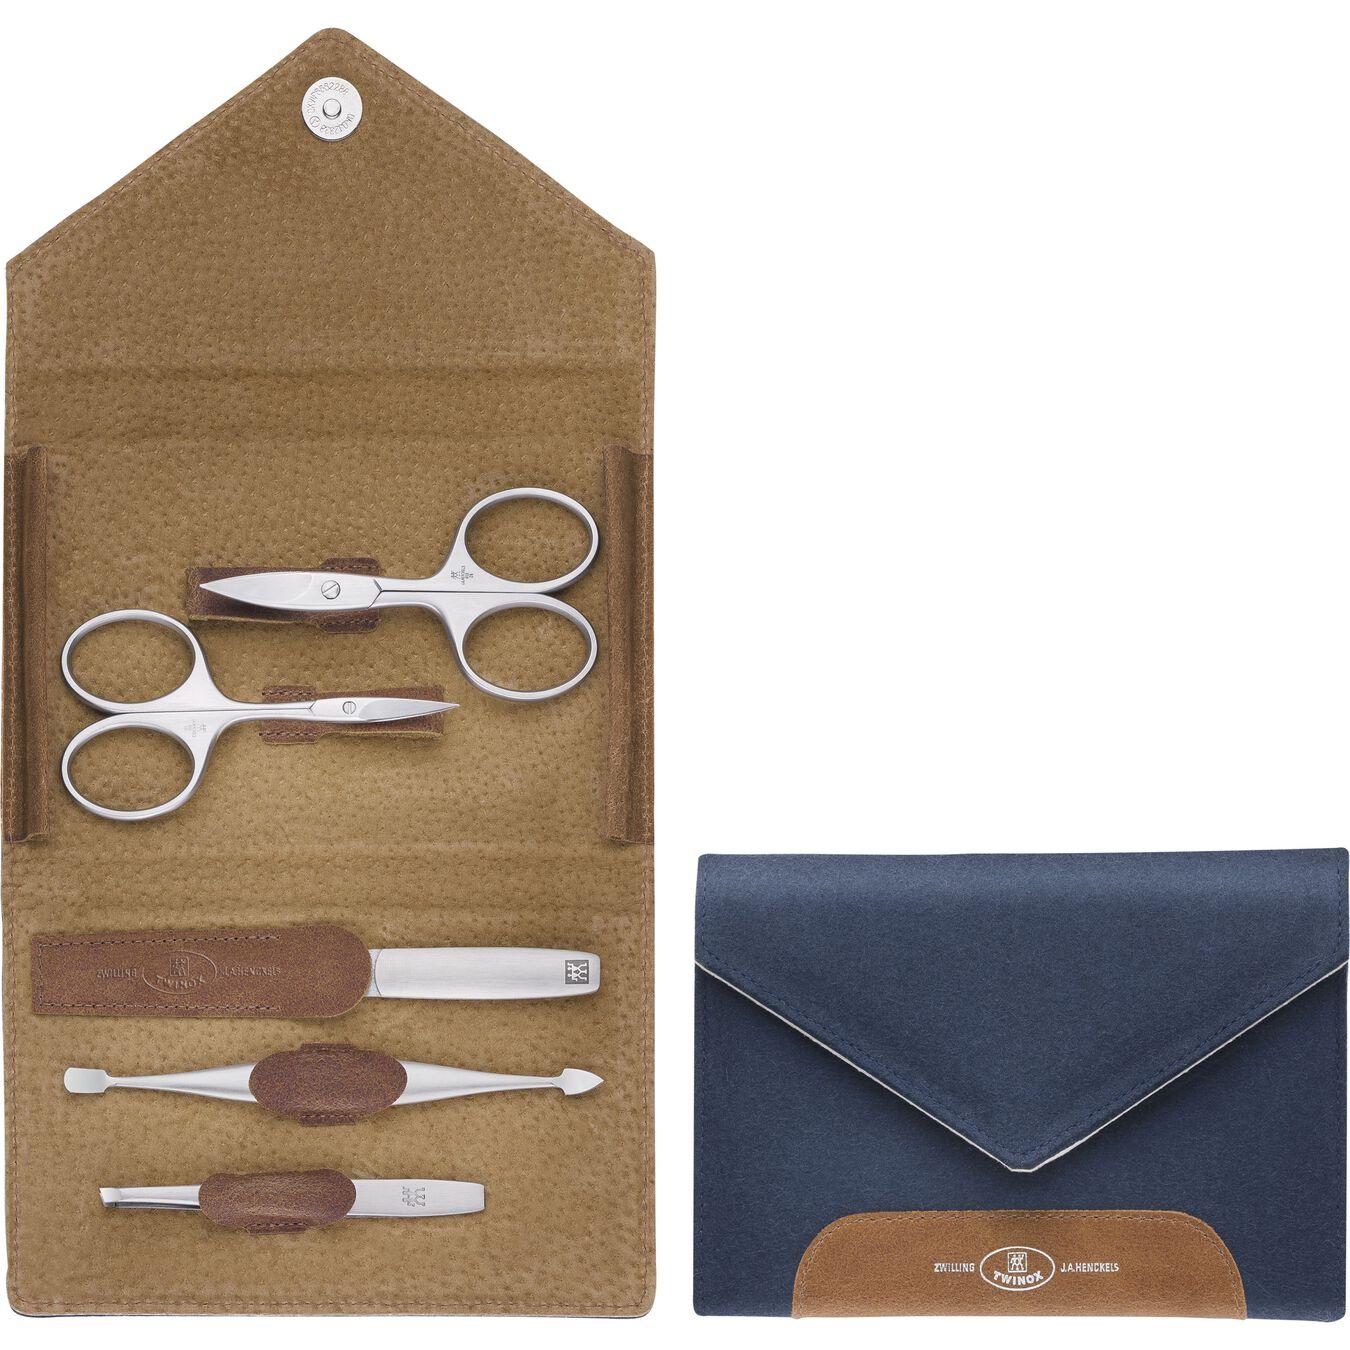 Snap fastener case, 5 Piece   Felt   Blue,,large 1